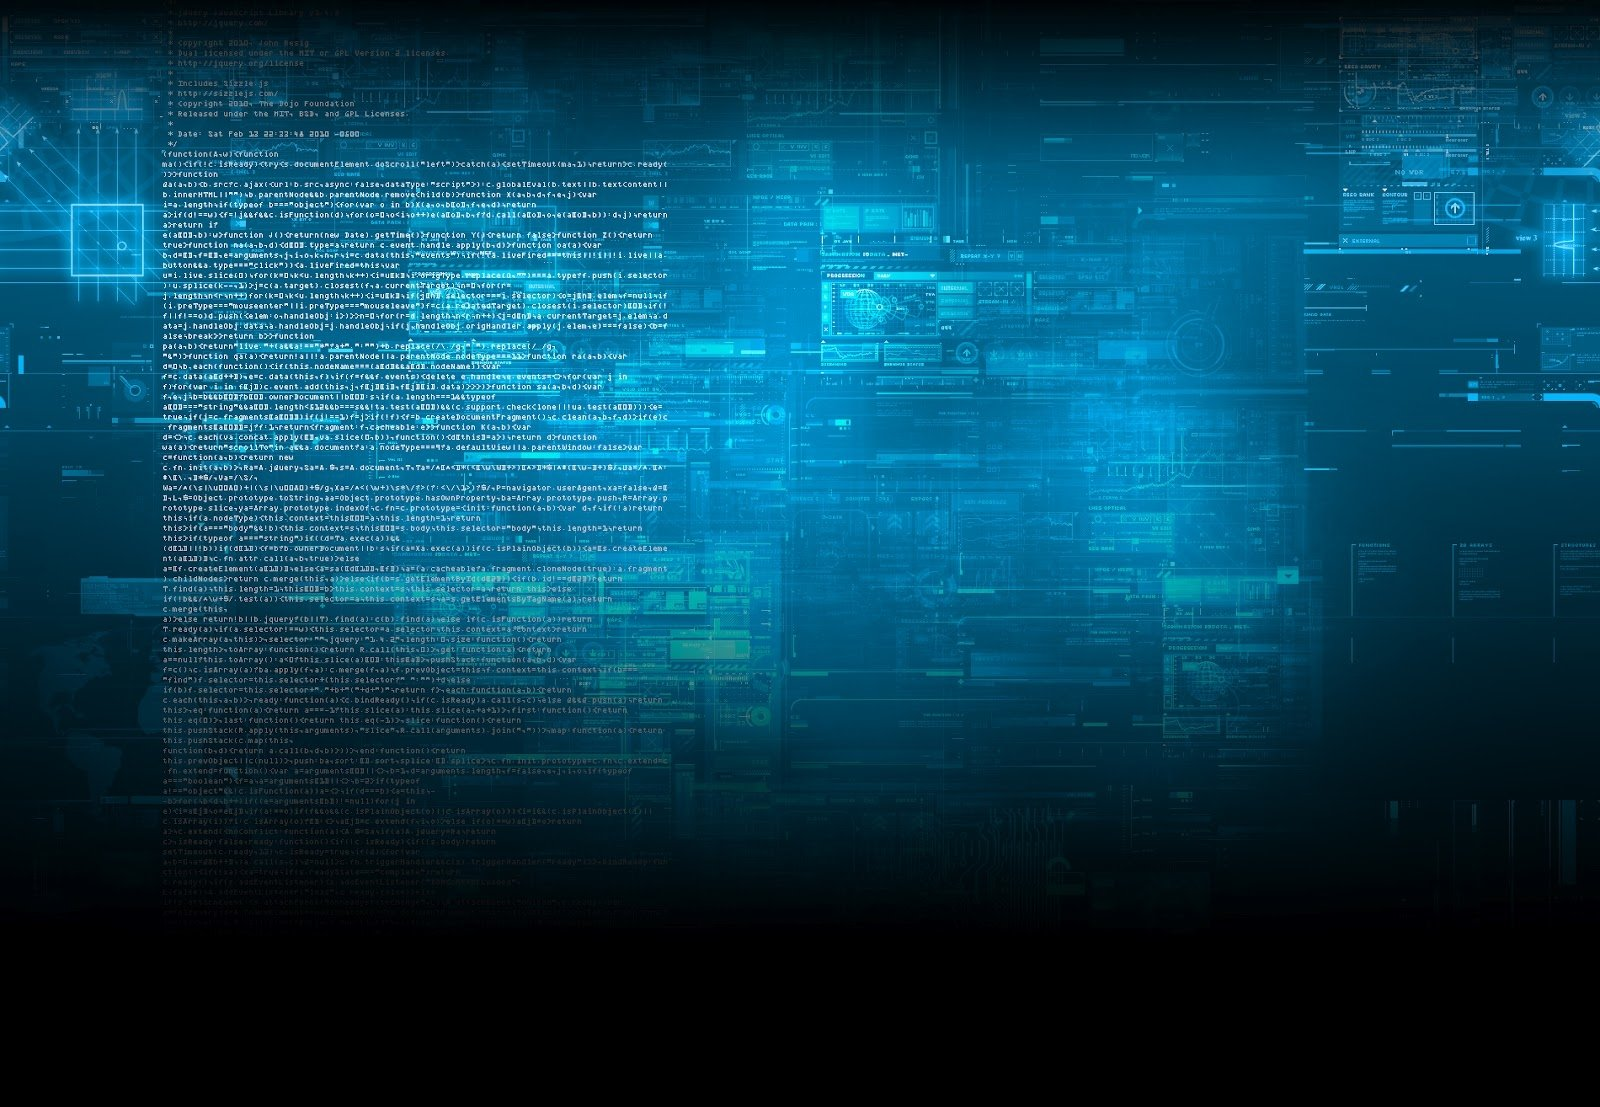 Data Bakgrund And Bakgrund 1600x1107 Id438688